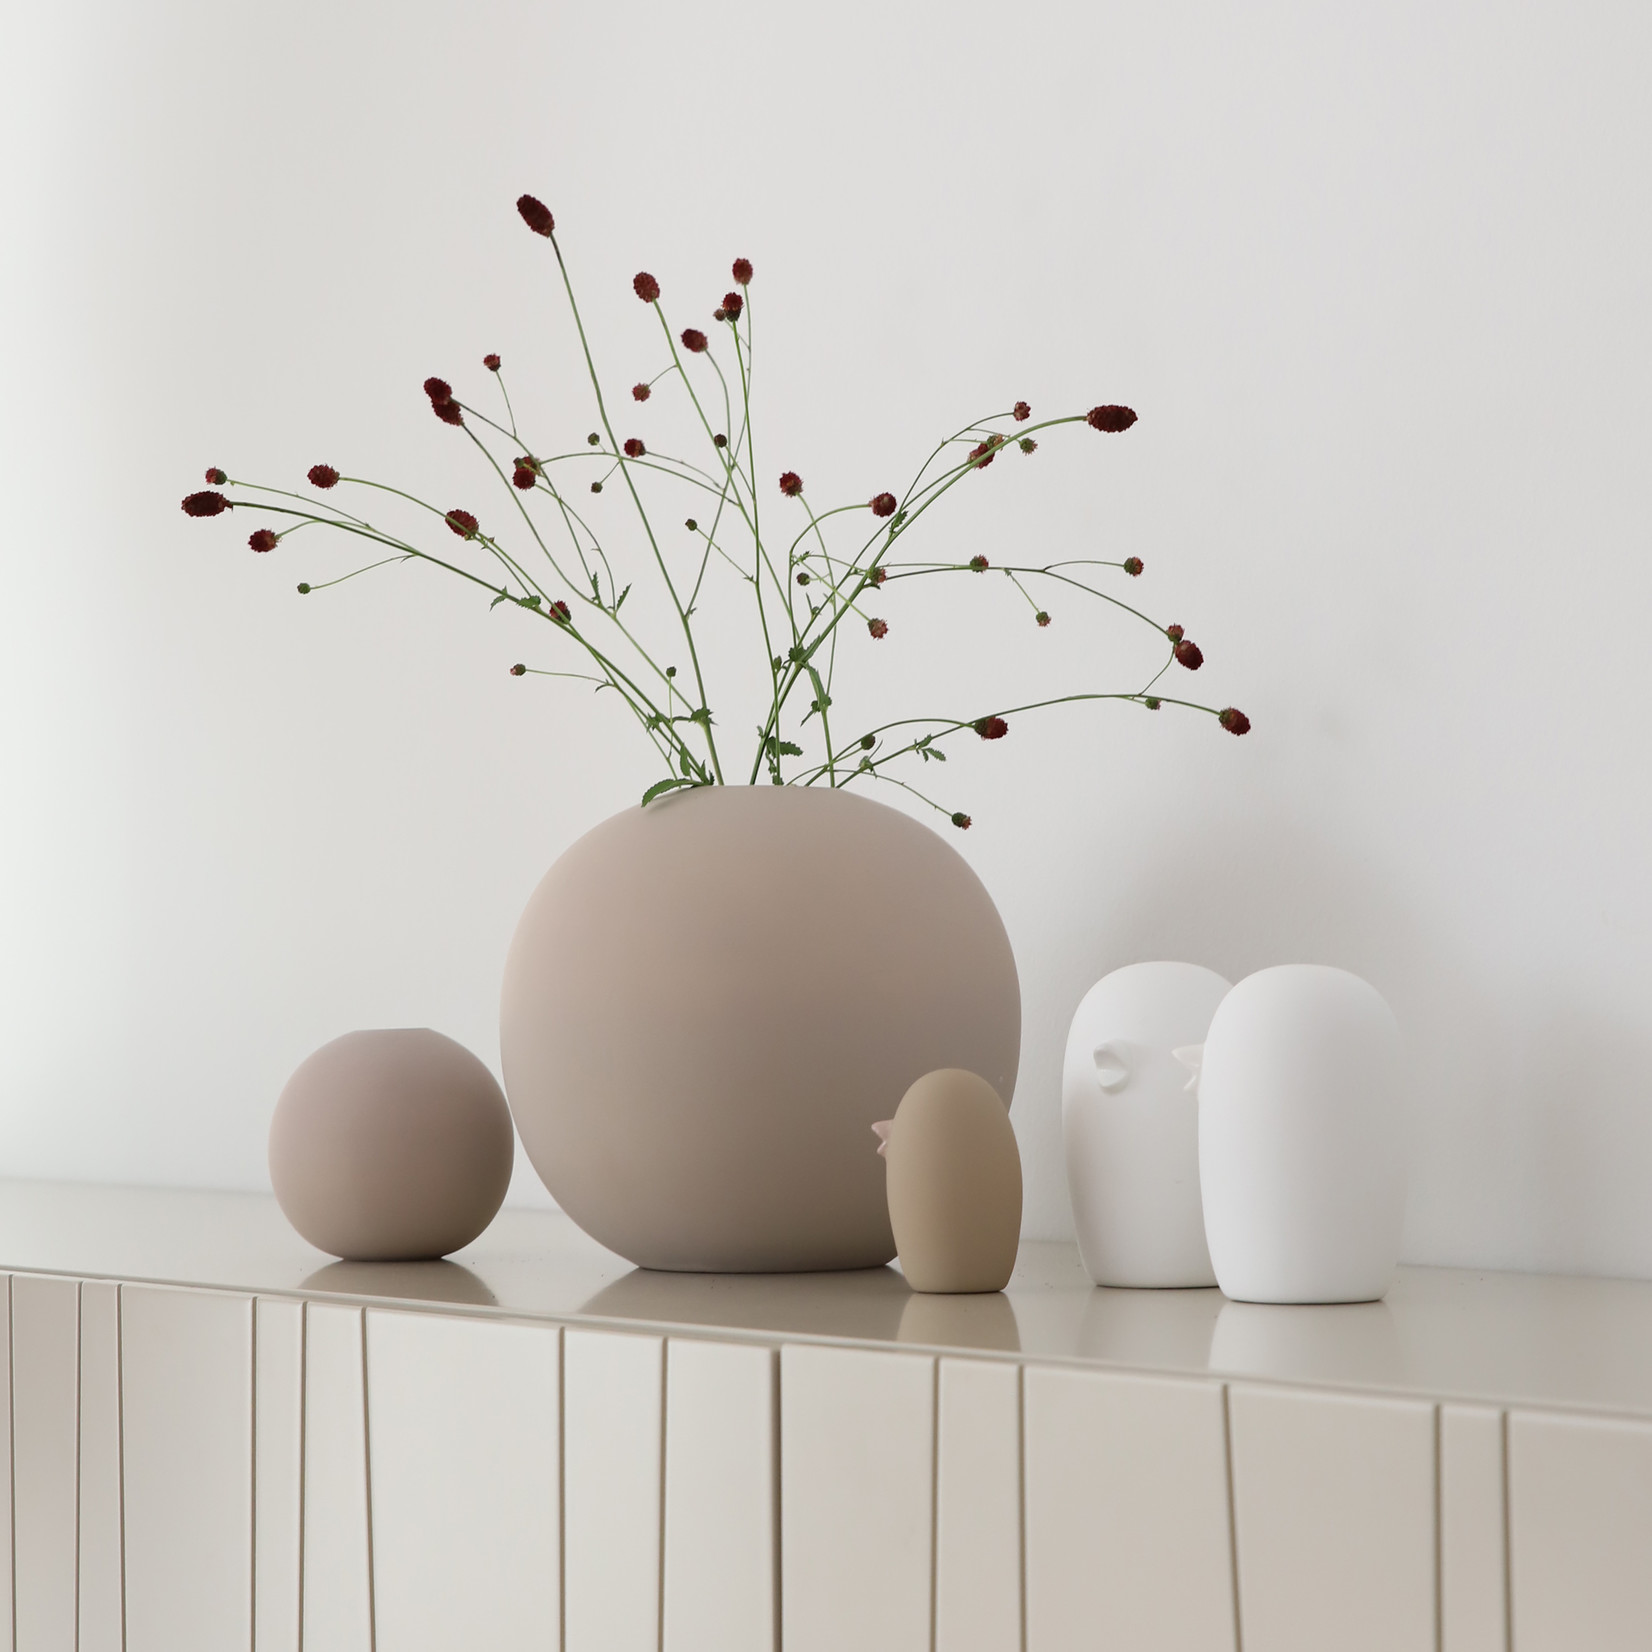 Cooee Design Keramik Vogel 12cm weiß